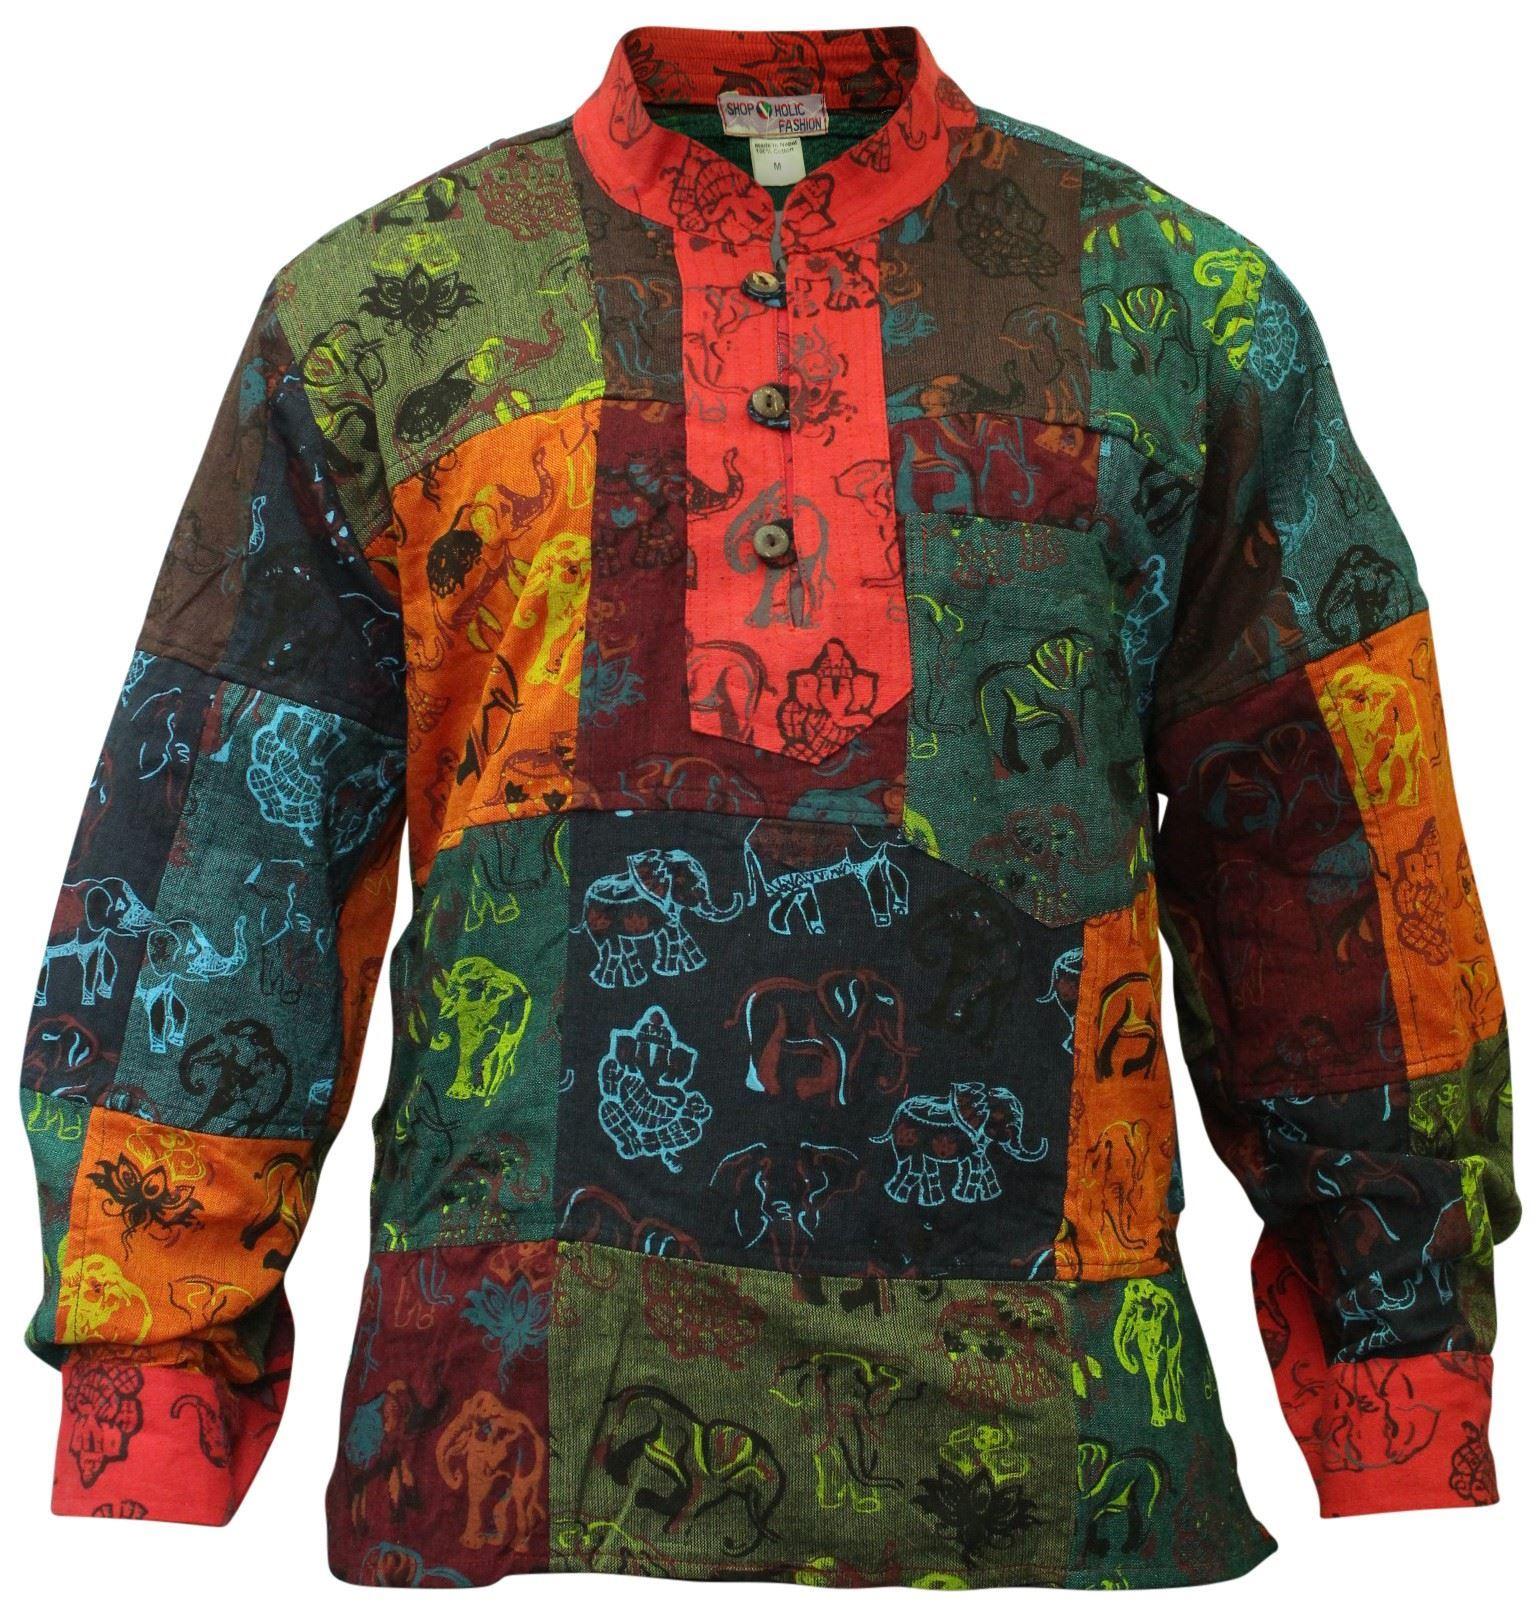 Mens-Collarless-Patchwork-Festival-Vintage-Summer-Colourful-Grandad-Hippie-Shirt thumbnail 7